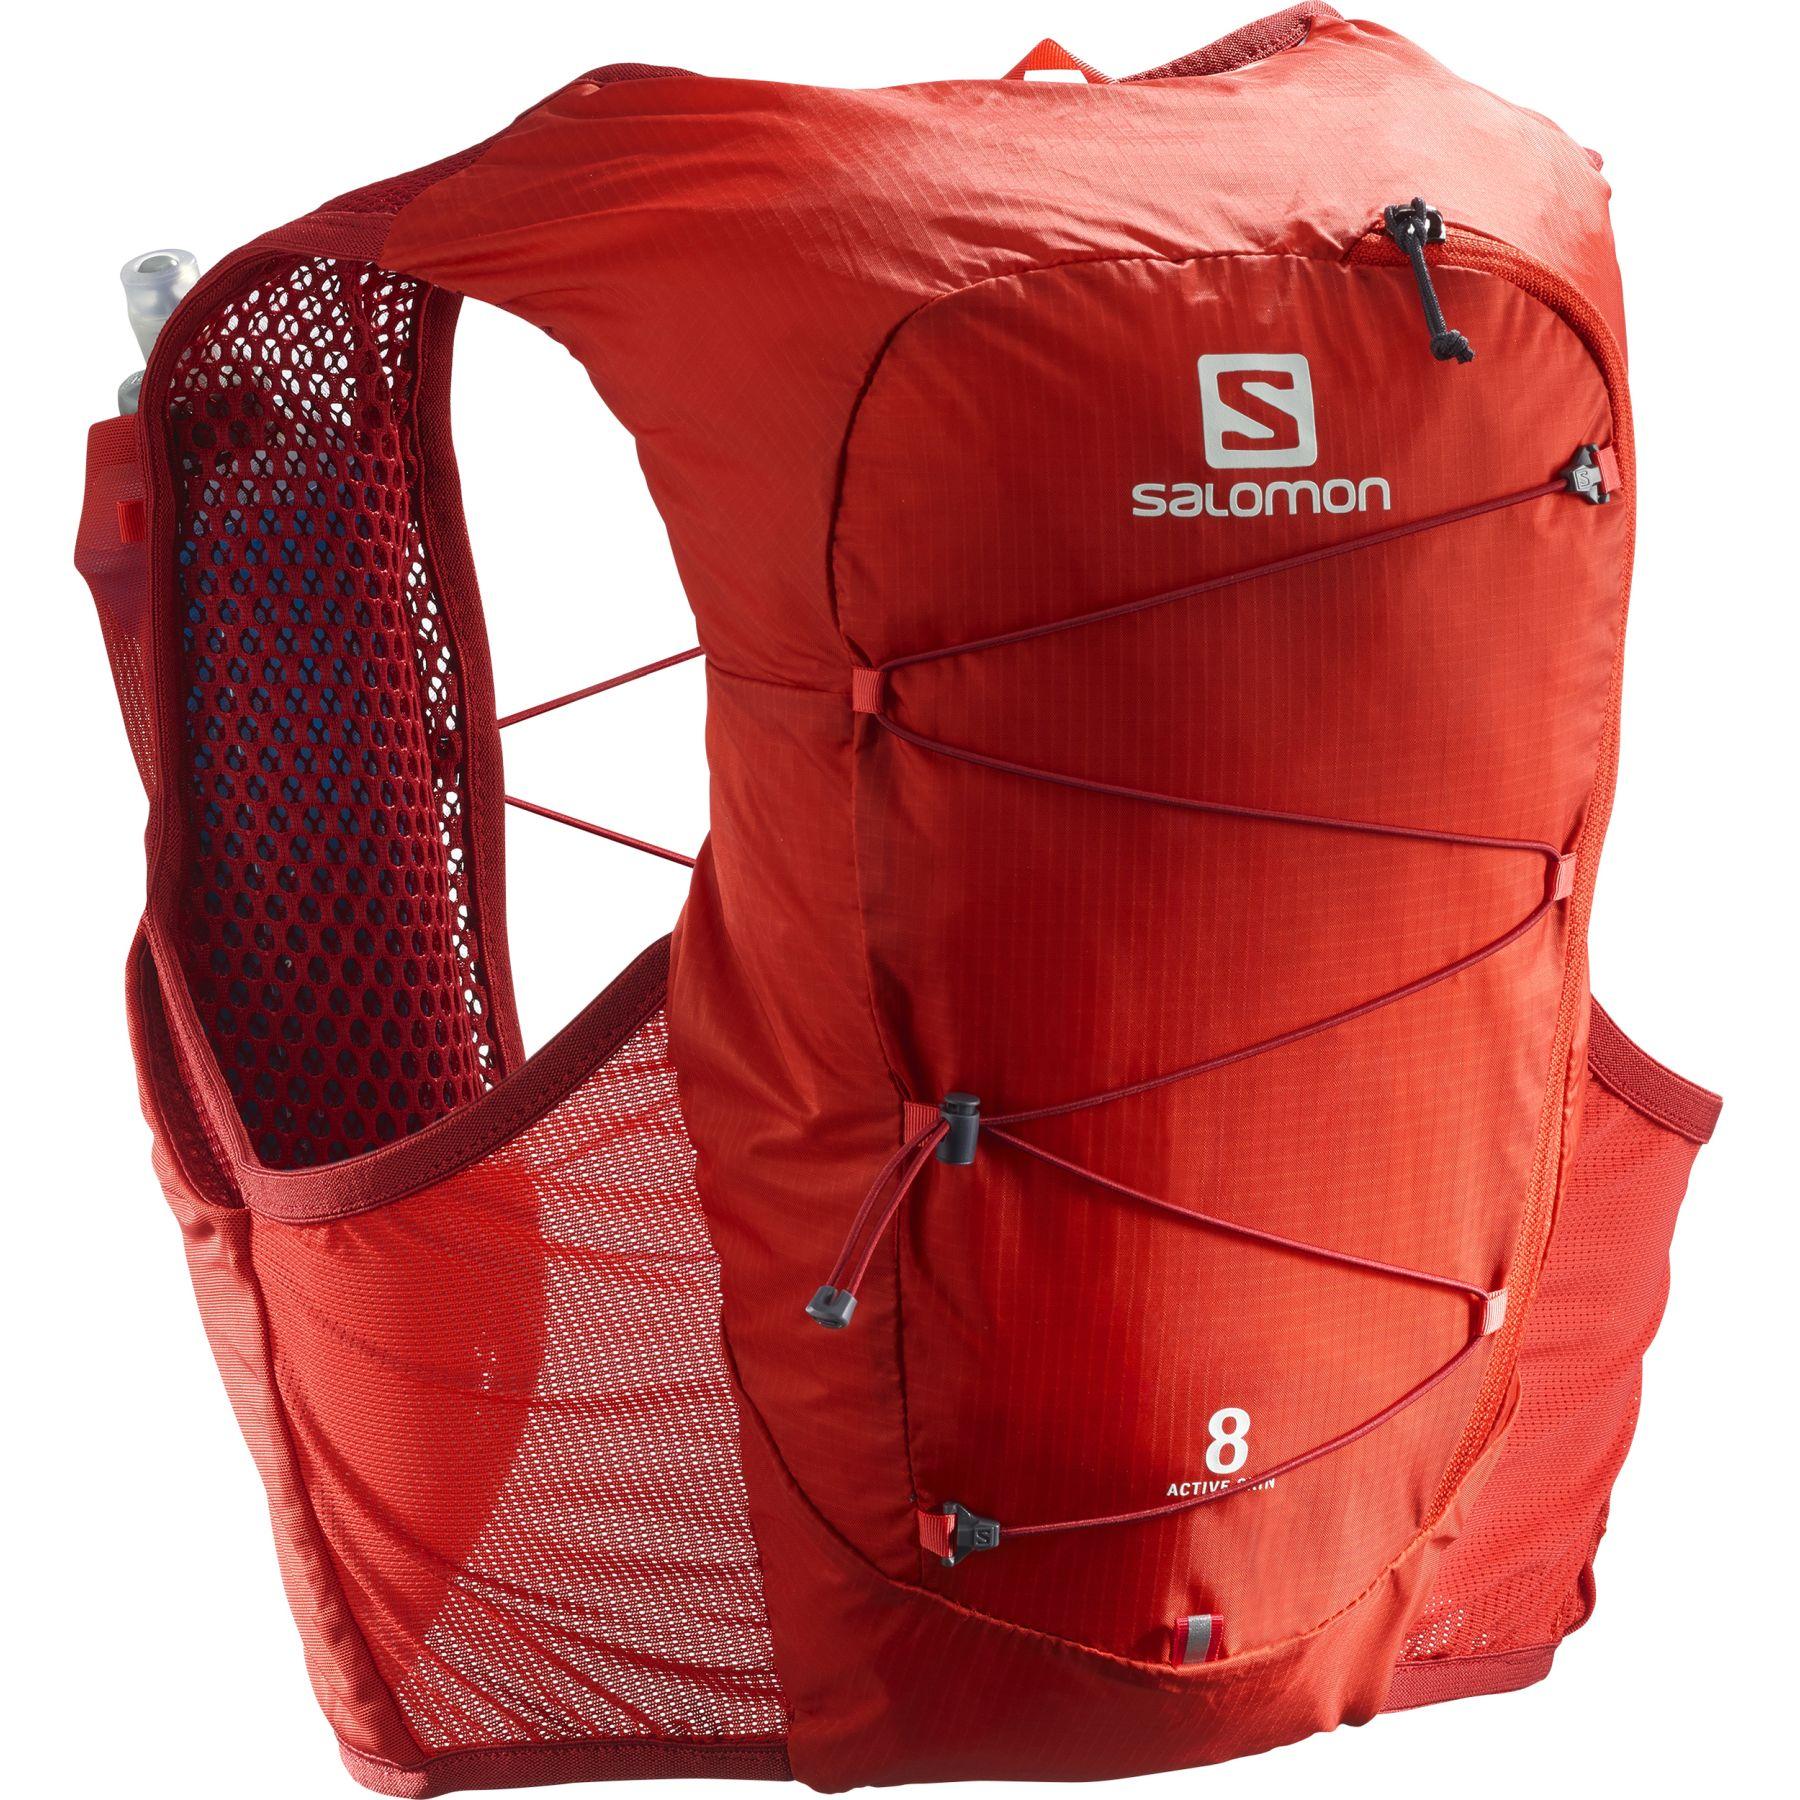 Picture of Salomon Active Skin 8 Set Running Vest - Valiant Poppy/Red Dahlia